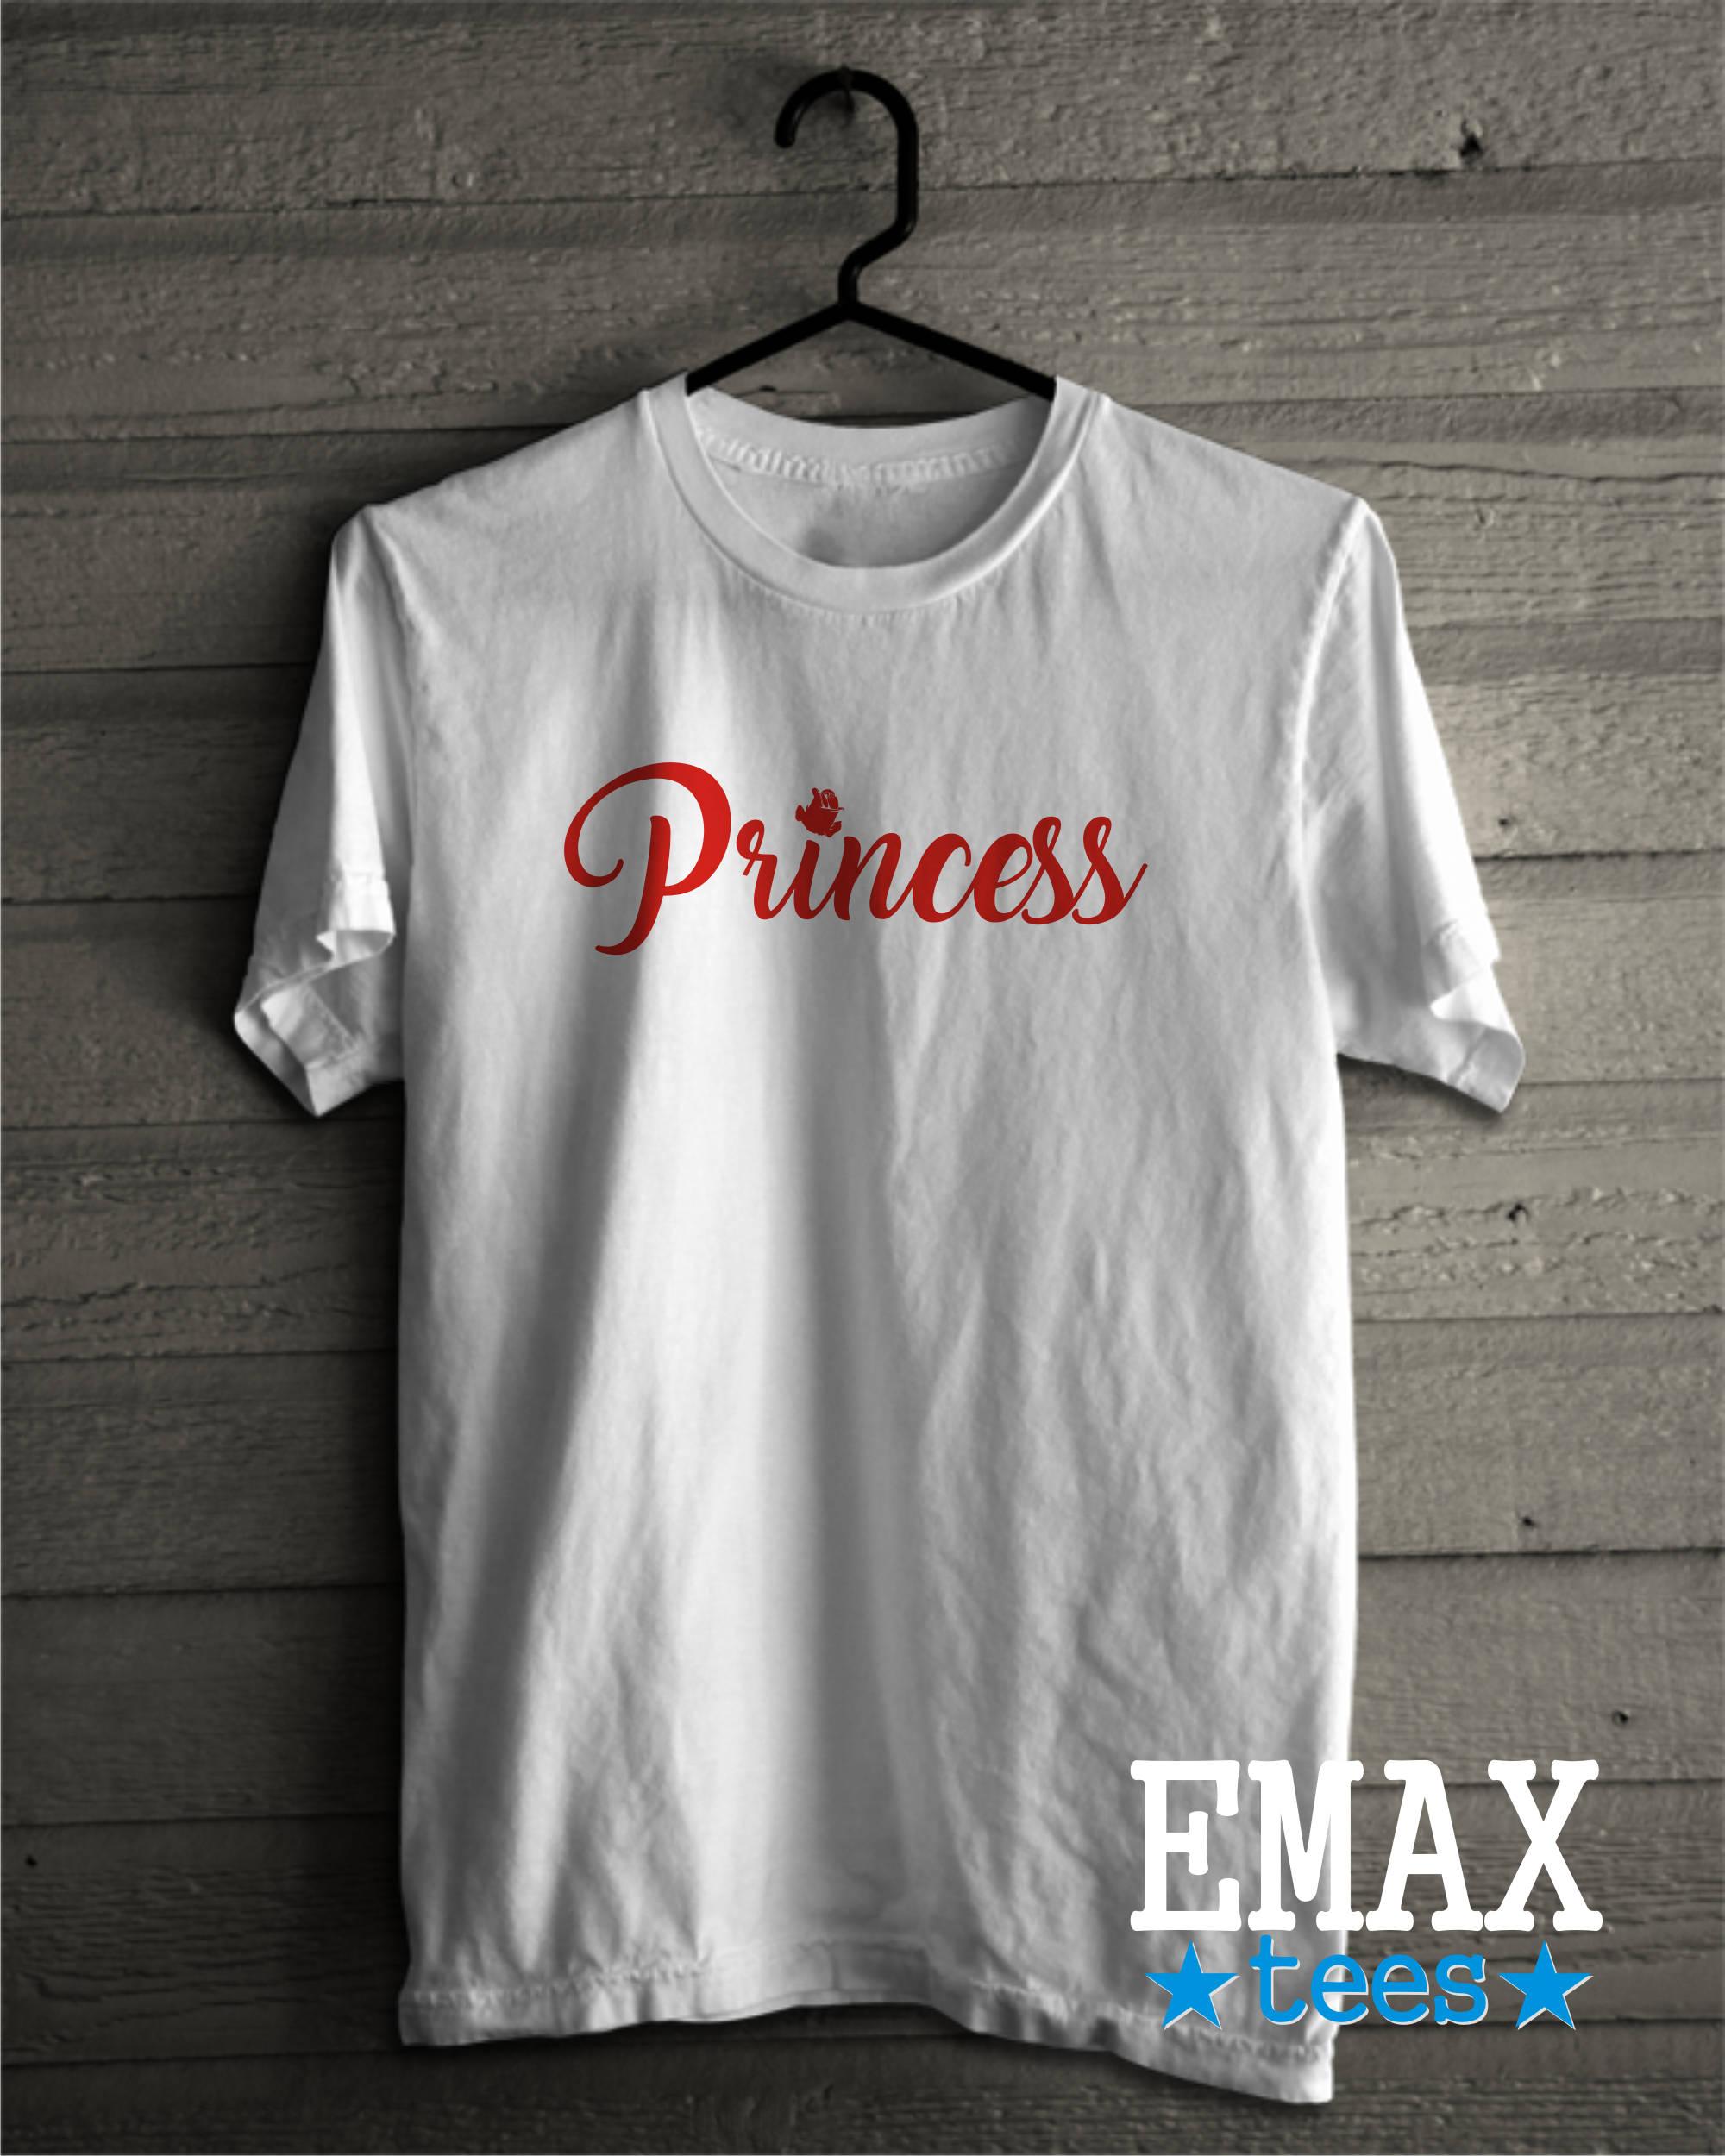 Princess Shirt Ddlg Top Rose T Shirt Princess Gift For Her